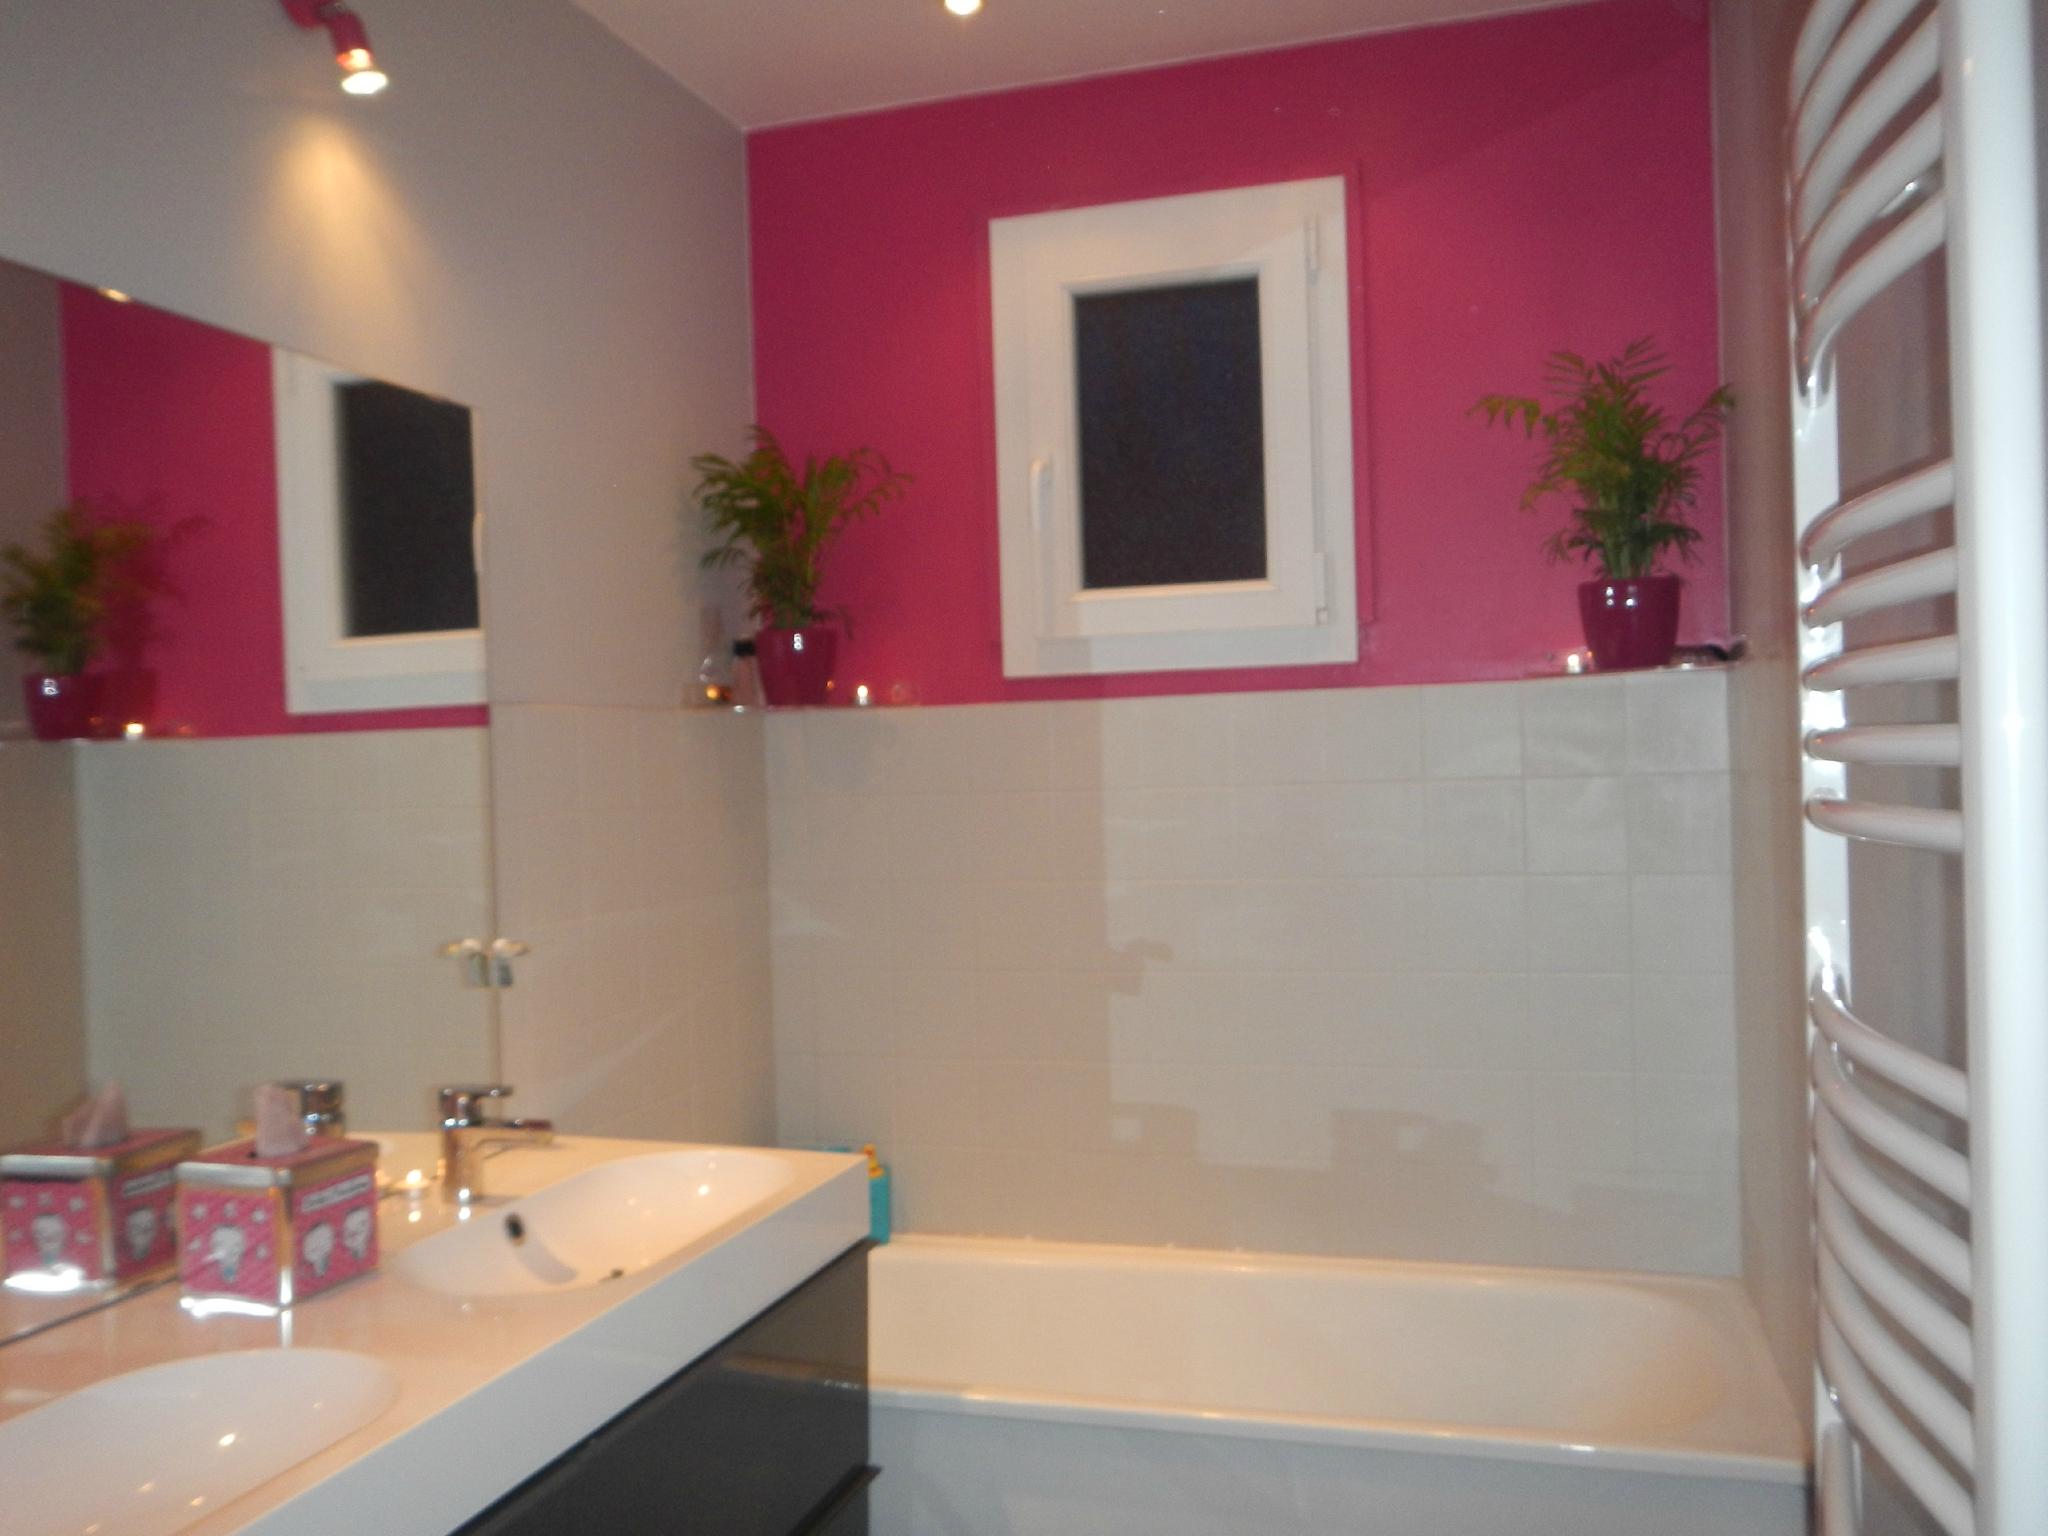 Peinture sur carrelage salle de bain avis - Livreetvin.fr